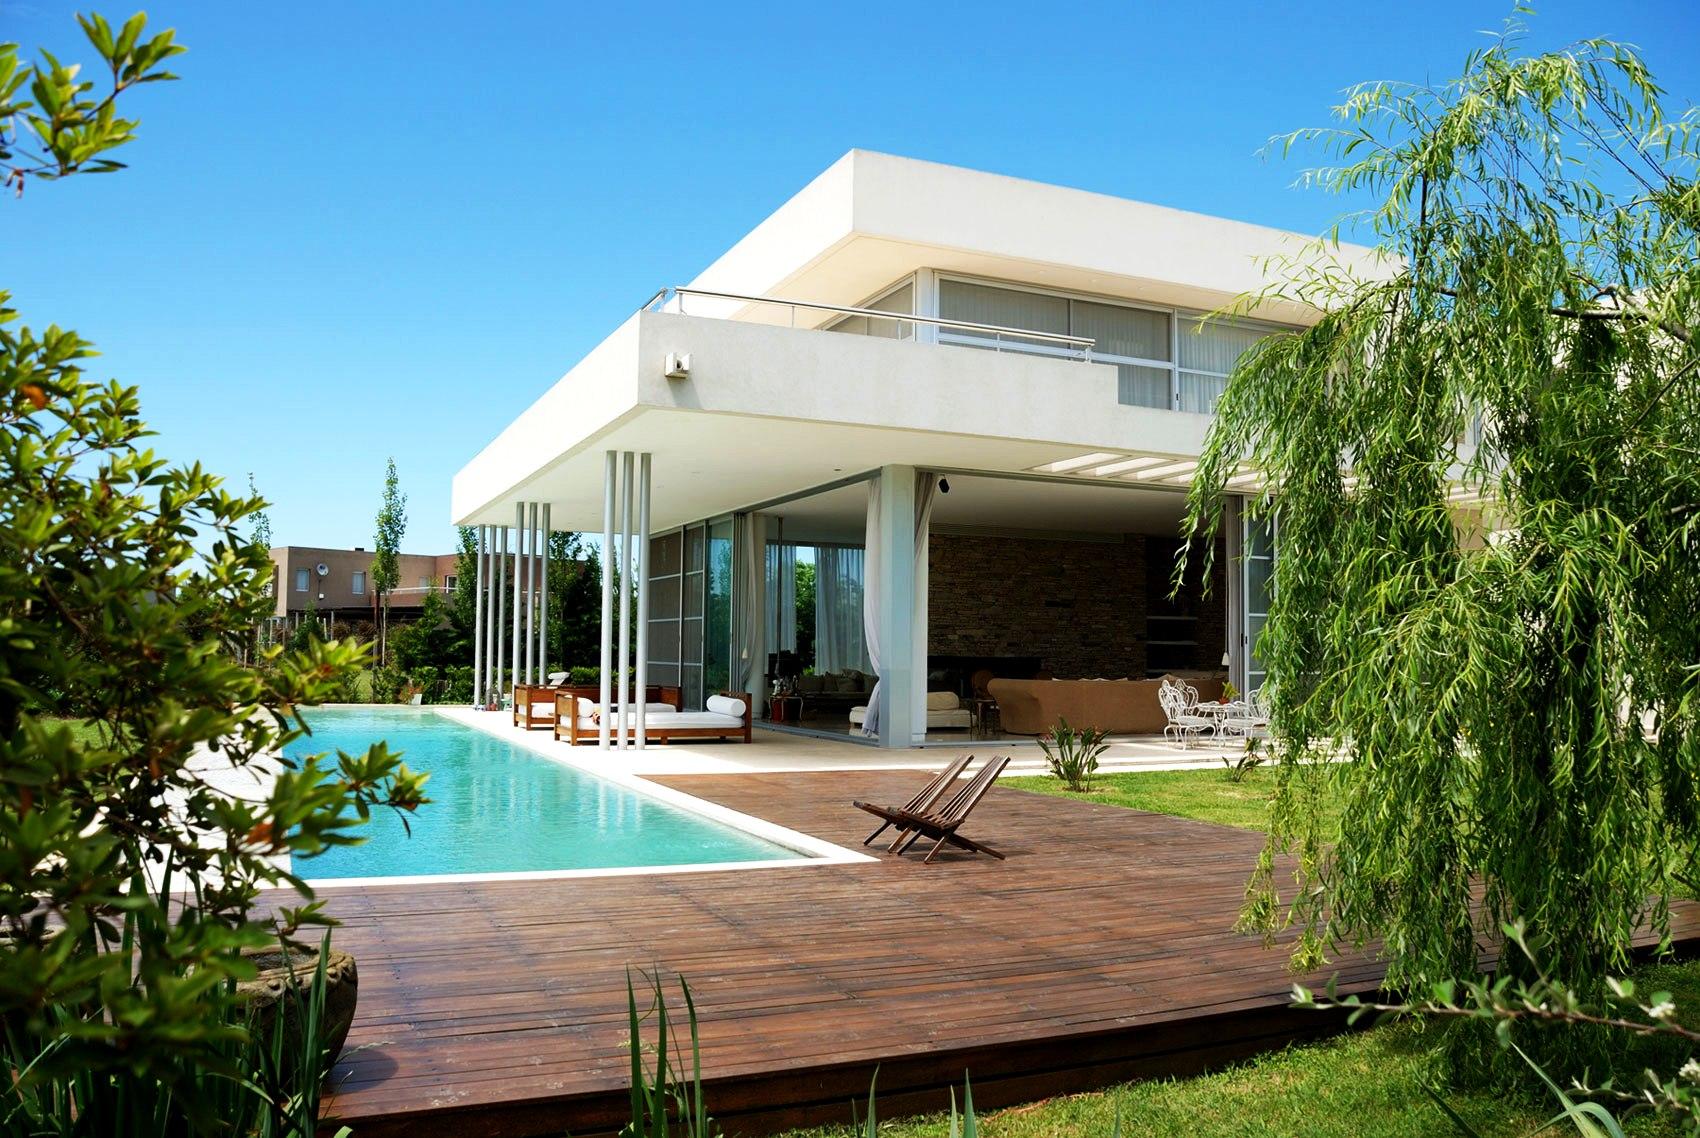 Backyard Pool Landscaping Ideas   HomesFeed on Modern Backyard Ideas With Pool id=94139